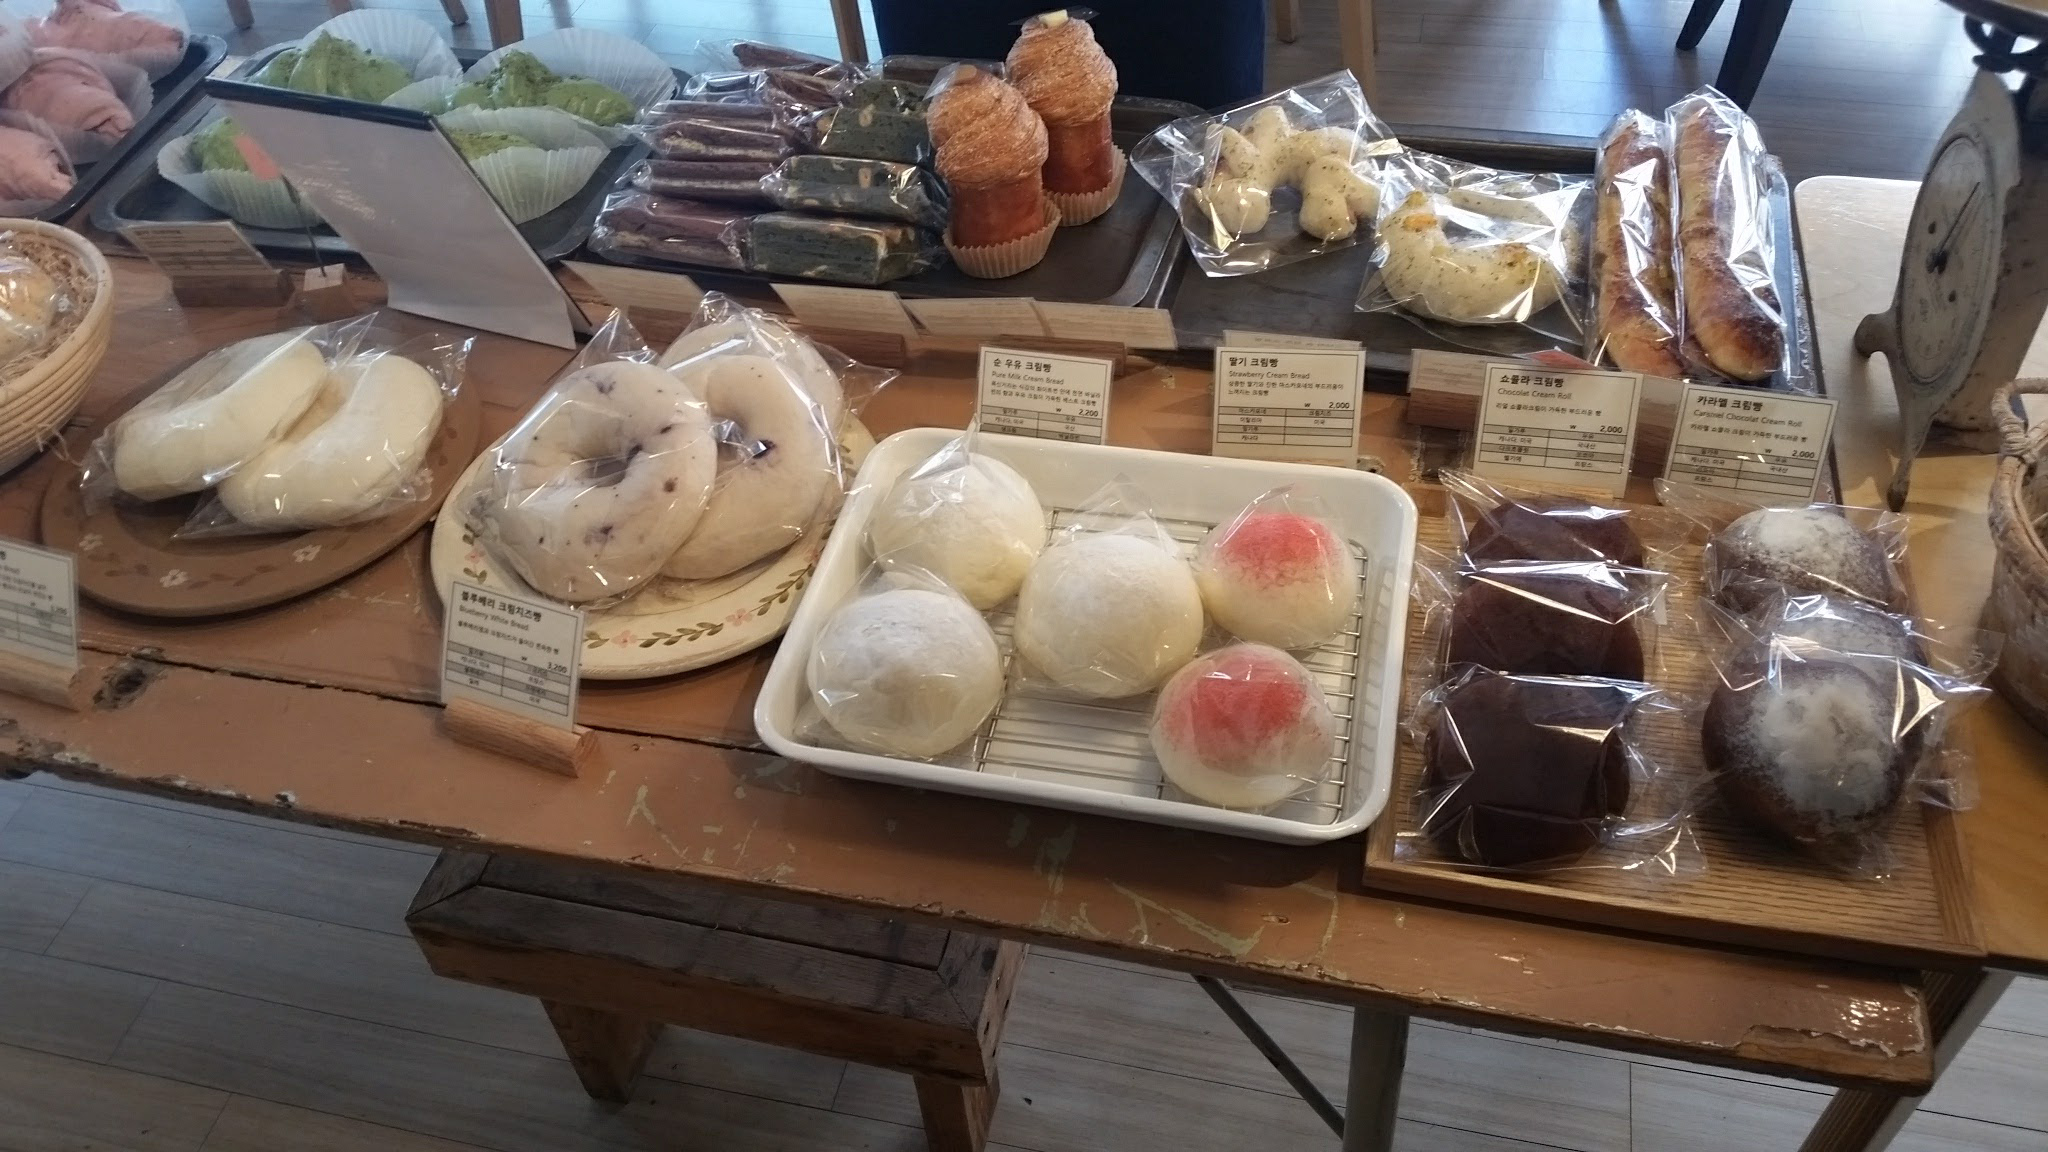 Gangnam - Maman Gateau Pastries